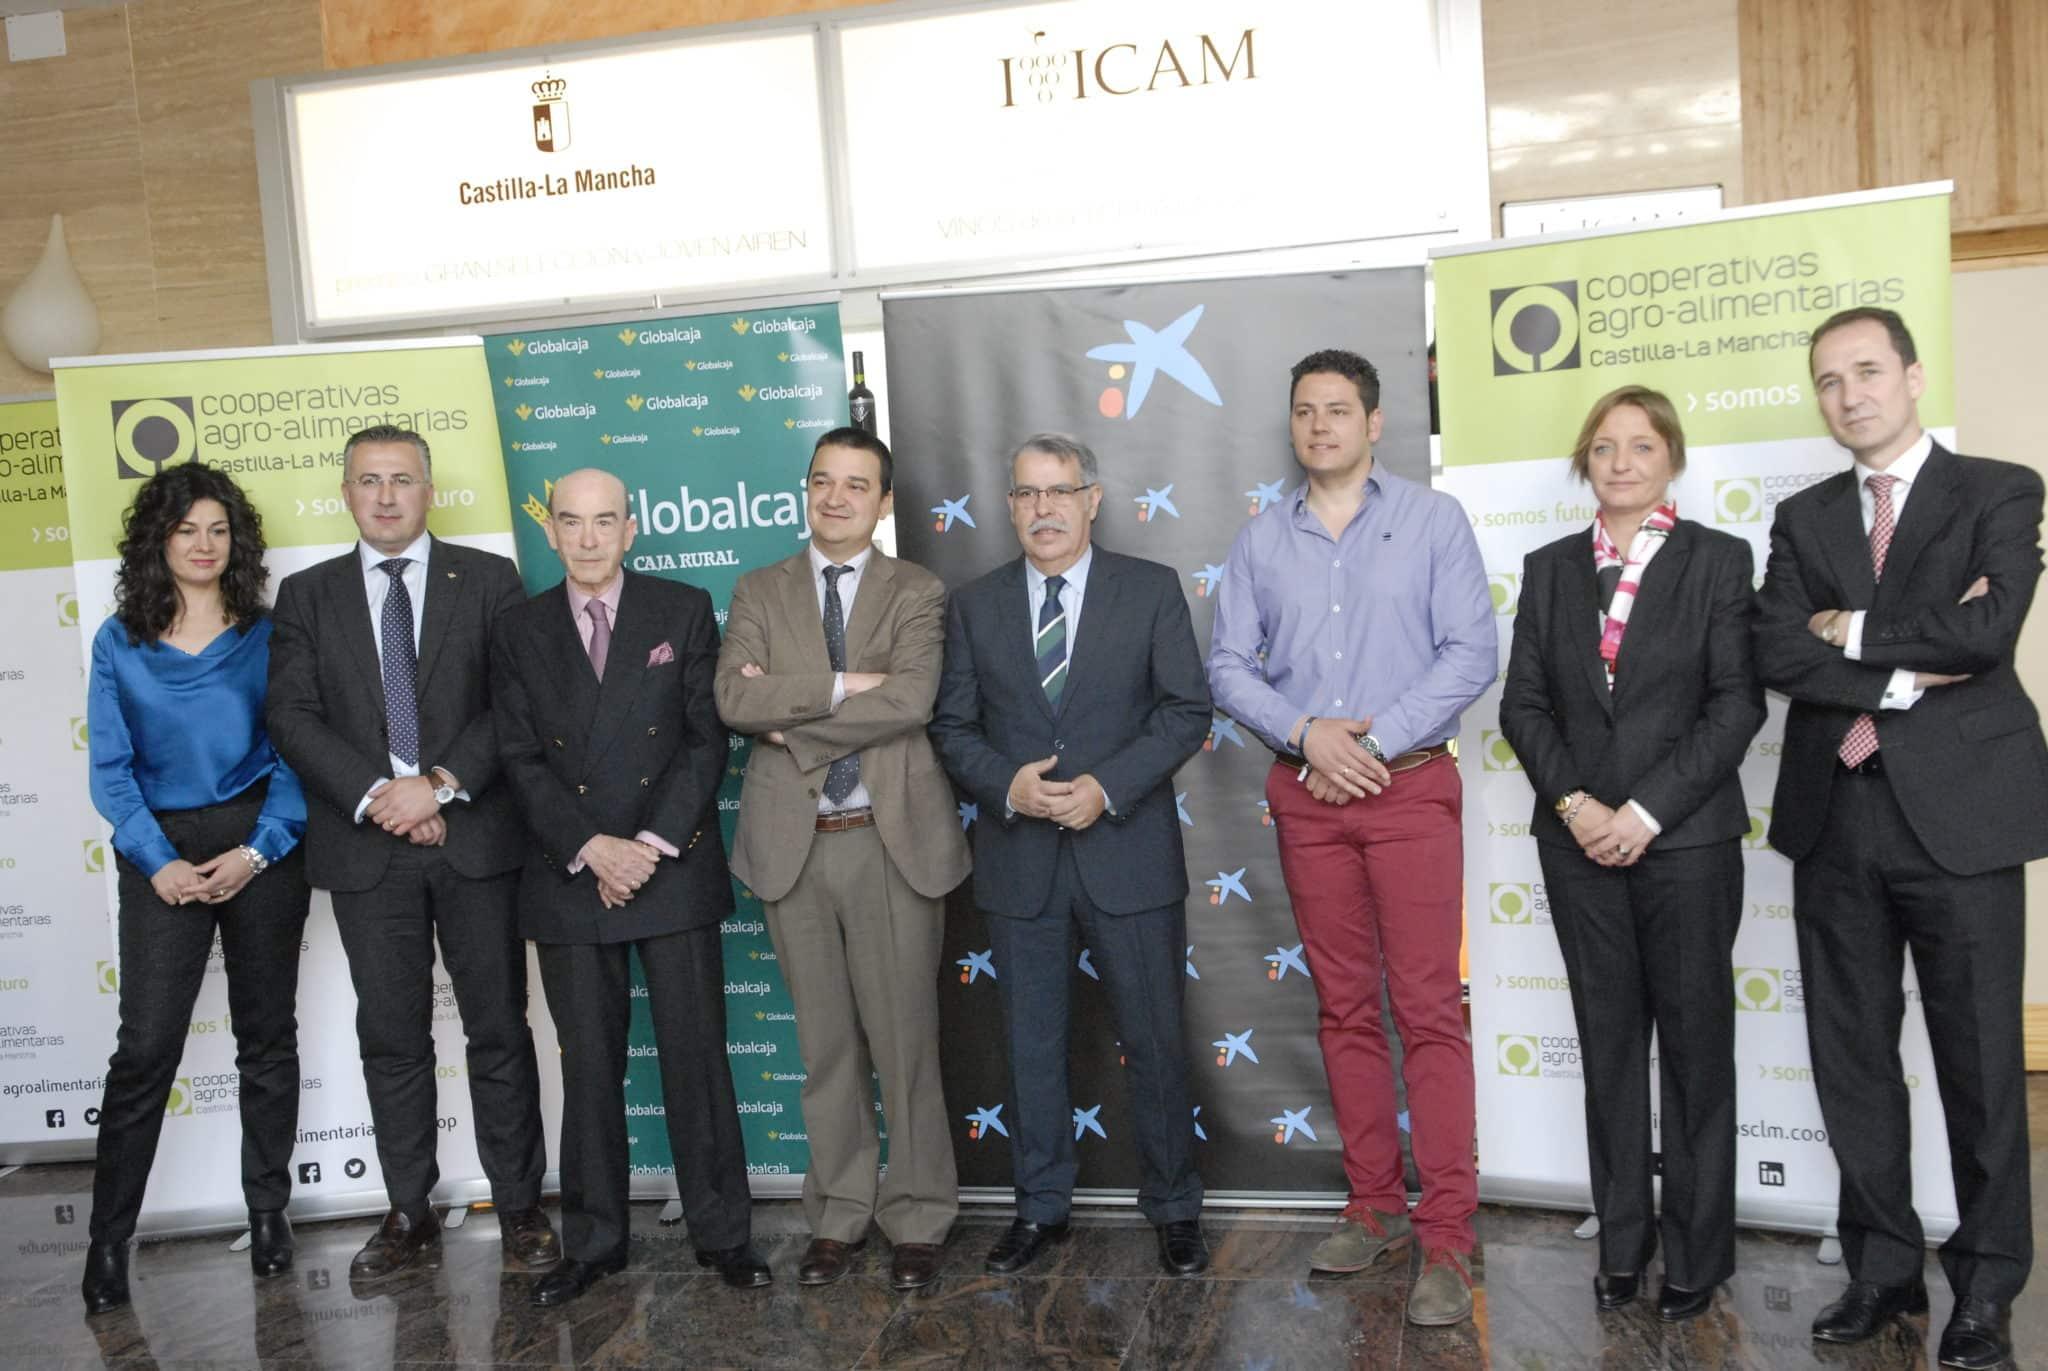 Globalcaja, en la jornada de la PAC de Cooperativas Agroalimentarias de Castilla-La Mancha